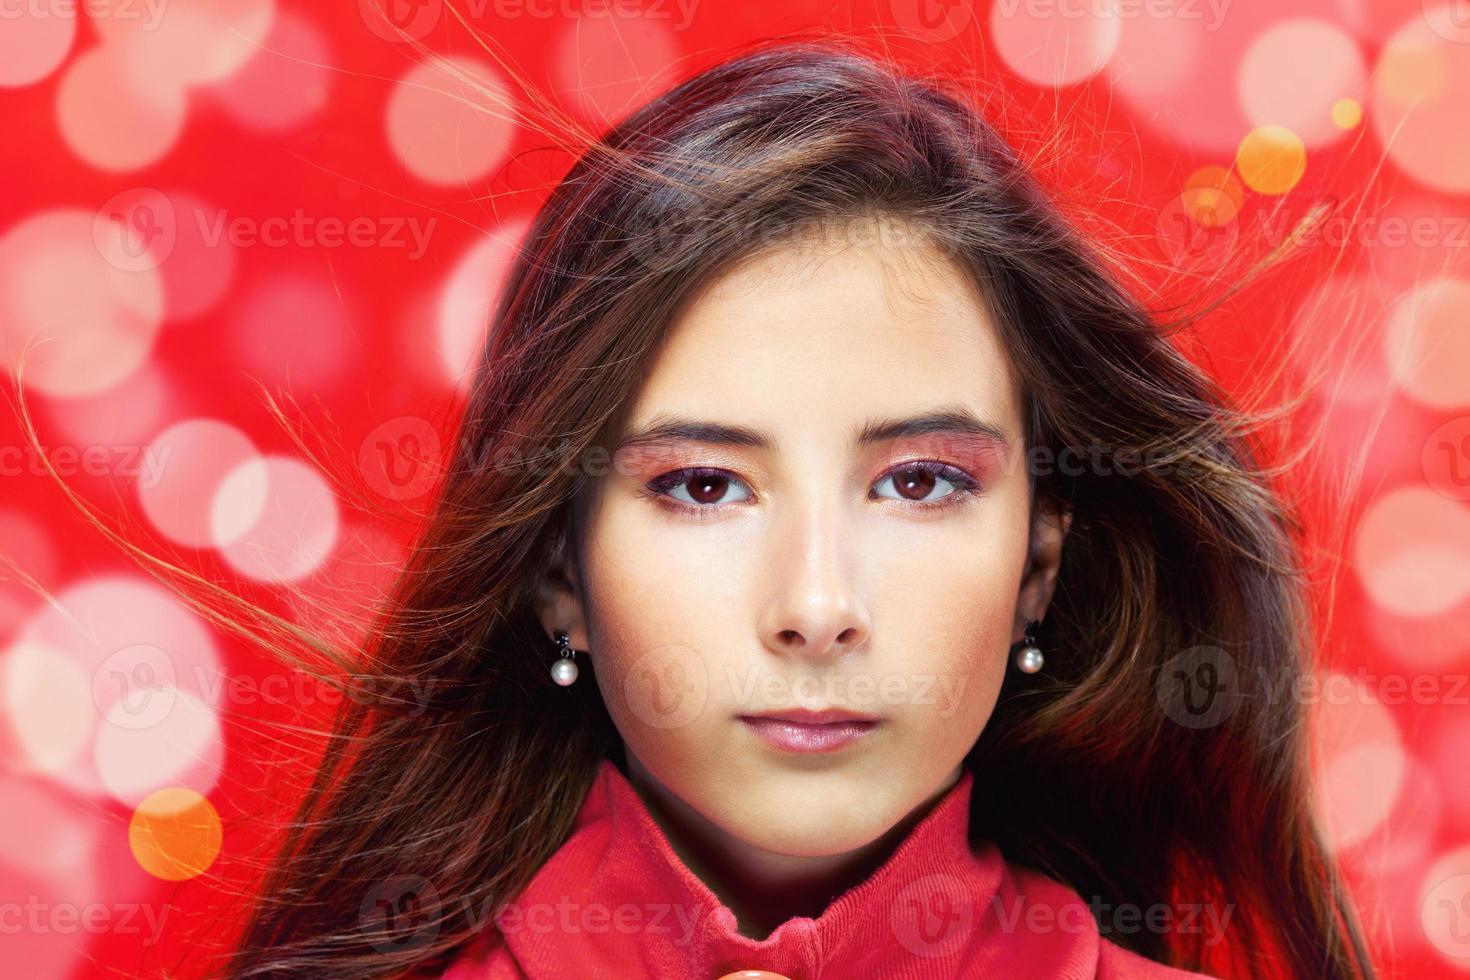 mode portret van mooi meisje lang bruin haar foto